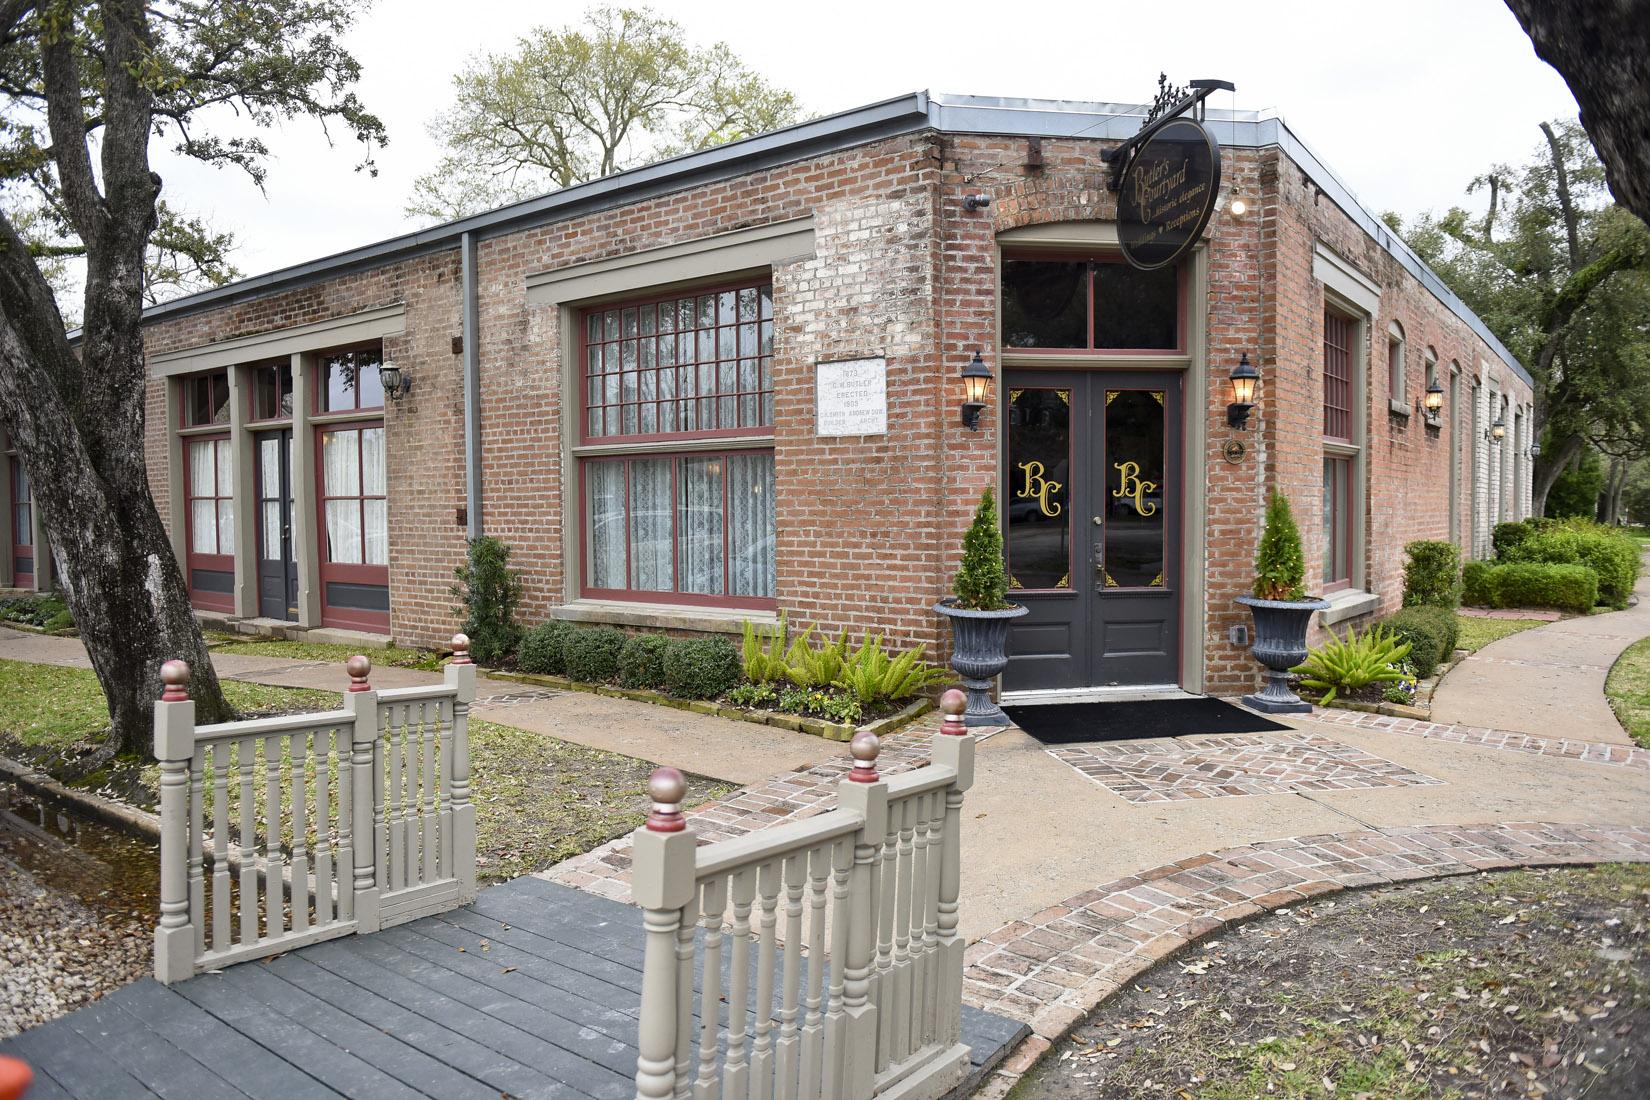 butlers-courtyard-wedding-venue-historic-houston-photos